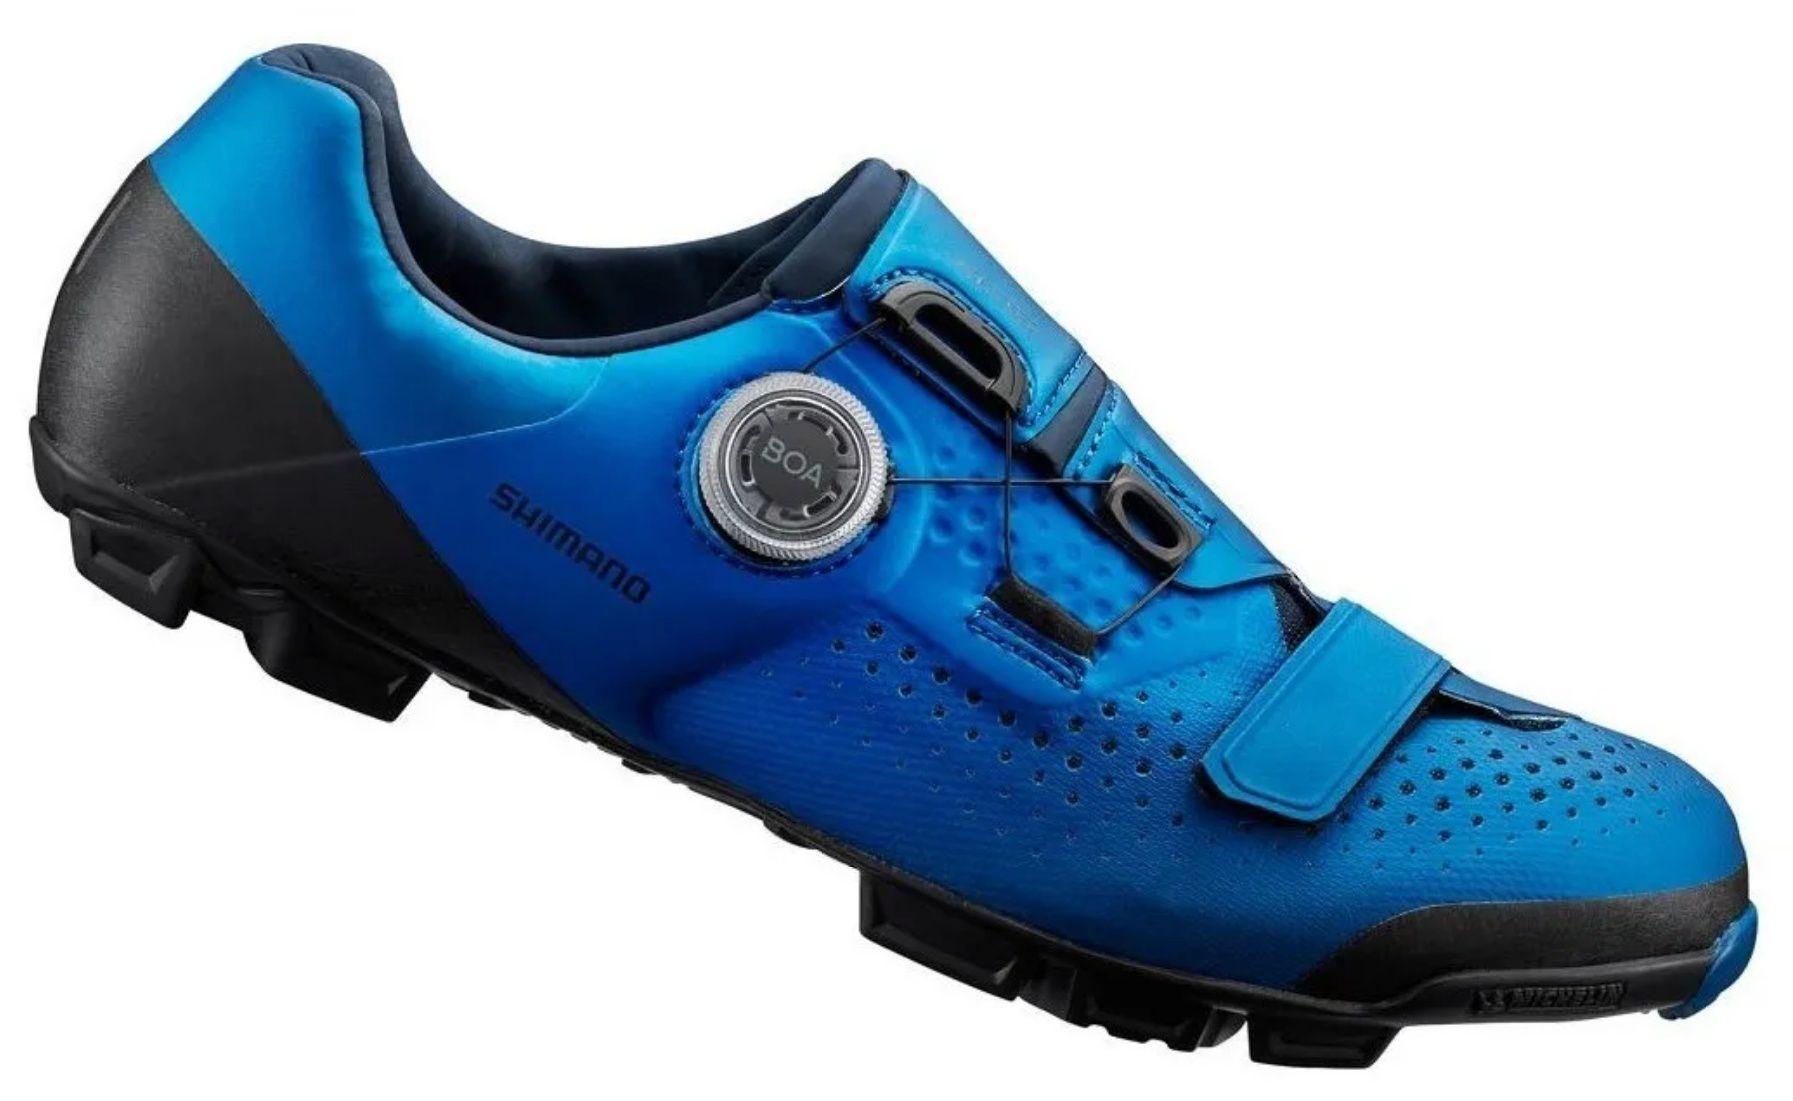 Sapatilha Shimano Sh-xc501 Sistema Boa Pedal Clip azul